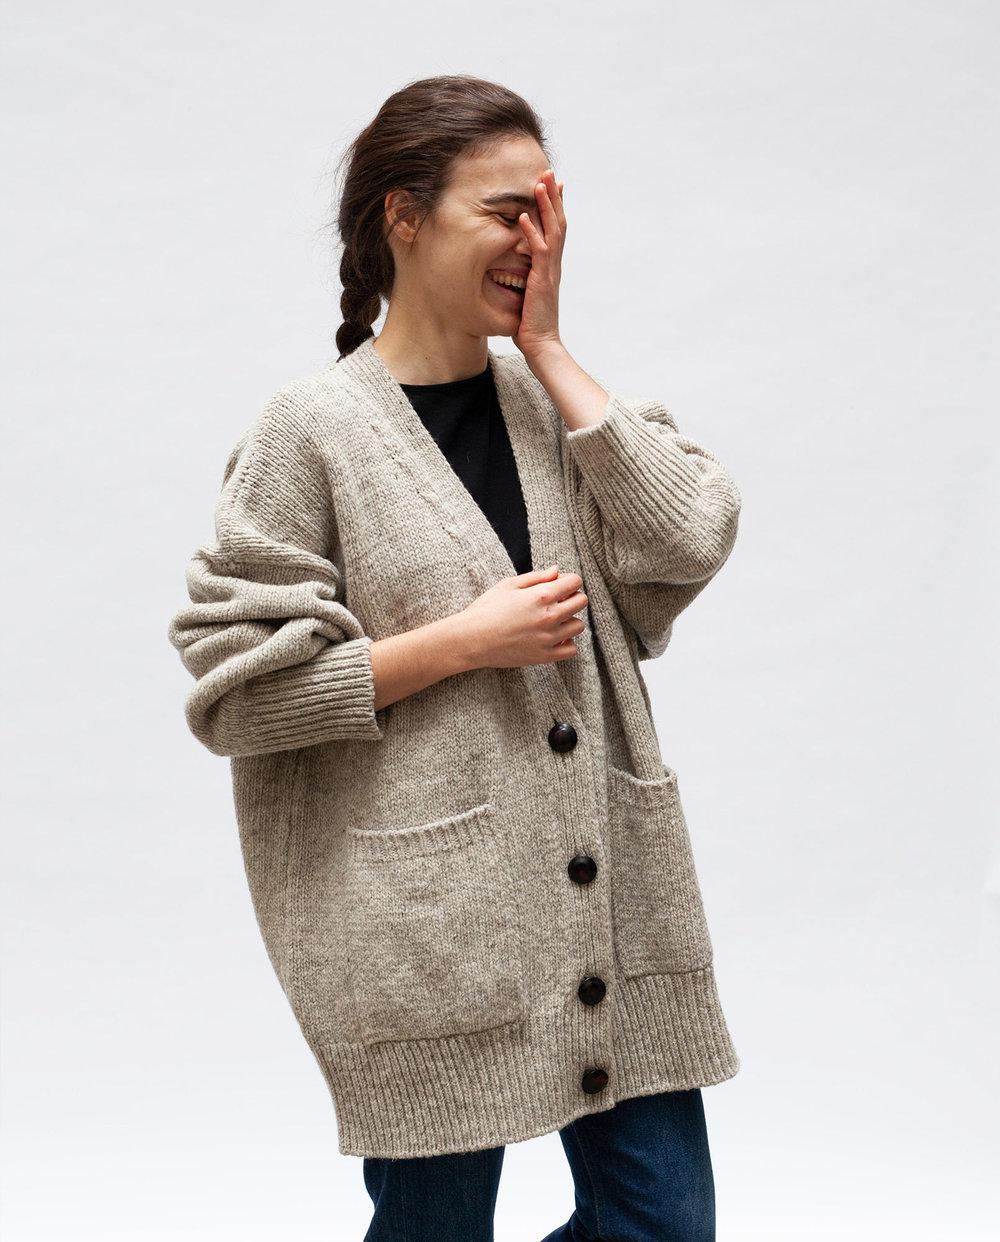 coat-woman-no17-mist-m1-web.jpg